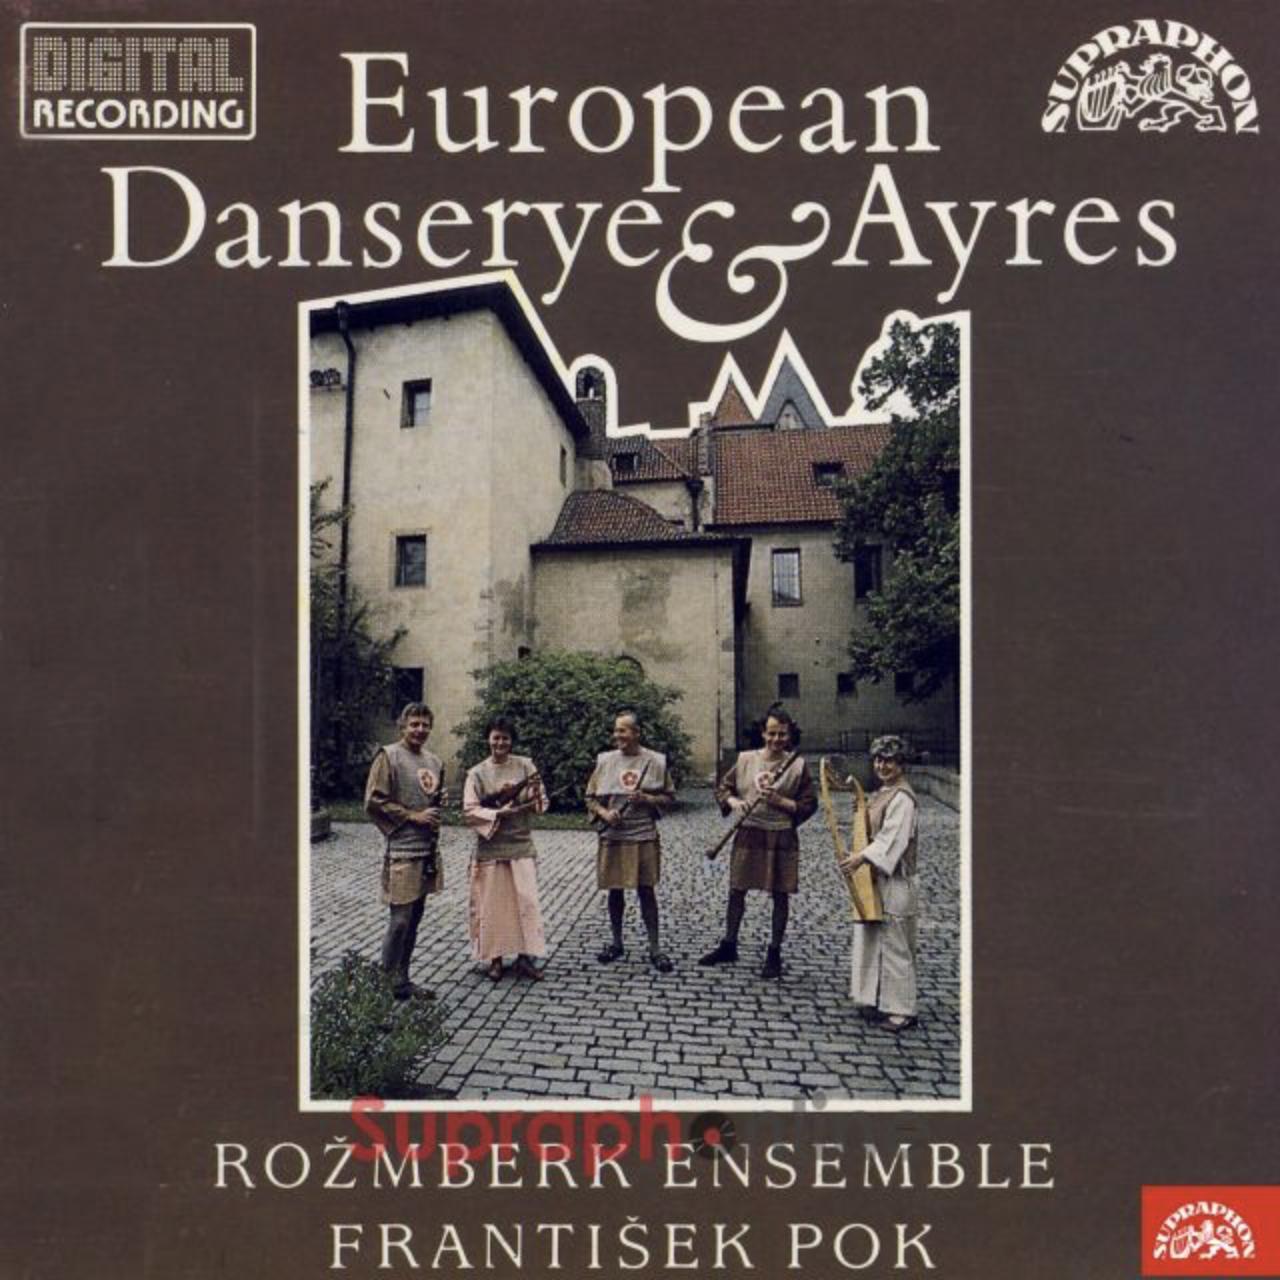 Rožmberská kepela – European Danserye & Ayres